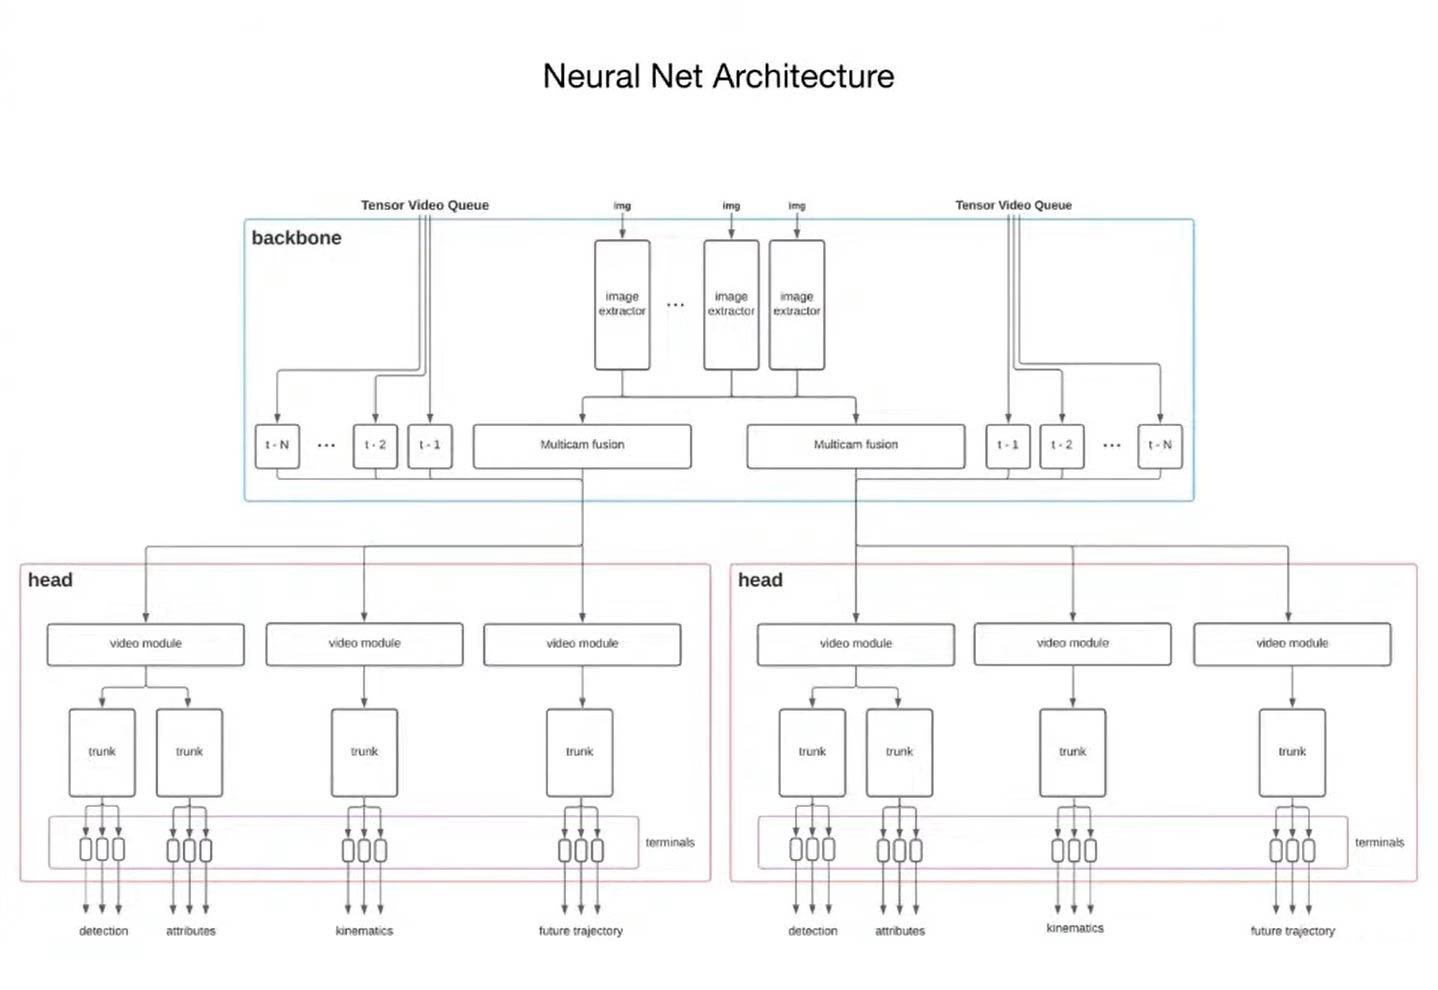 Flow diagram of the Tesla Neural Net architecture.